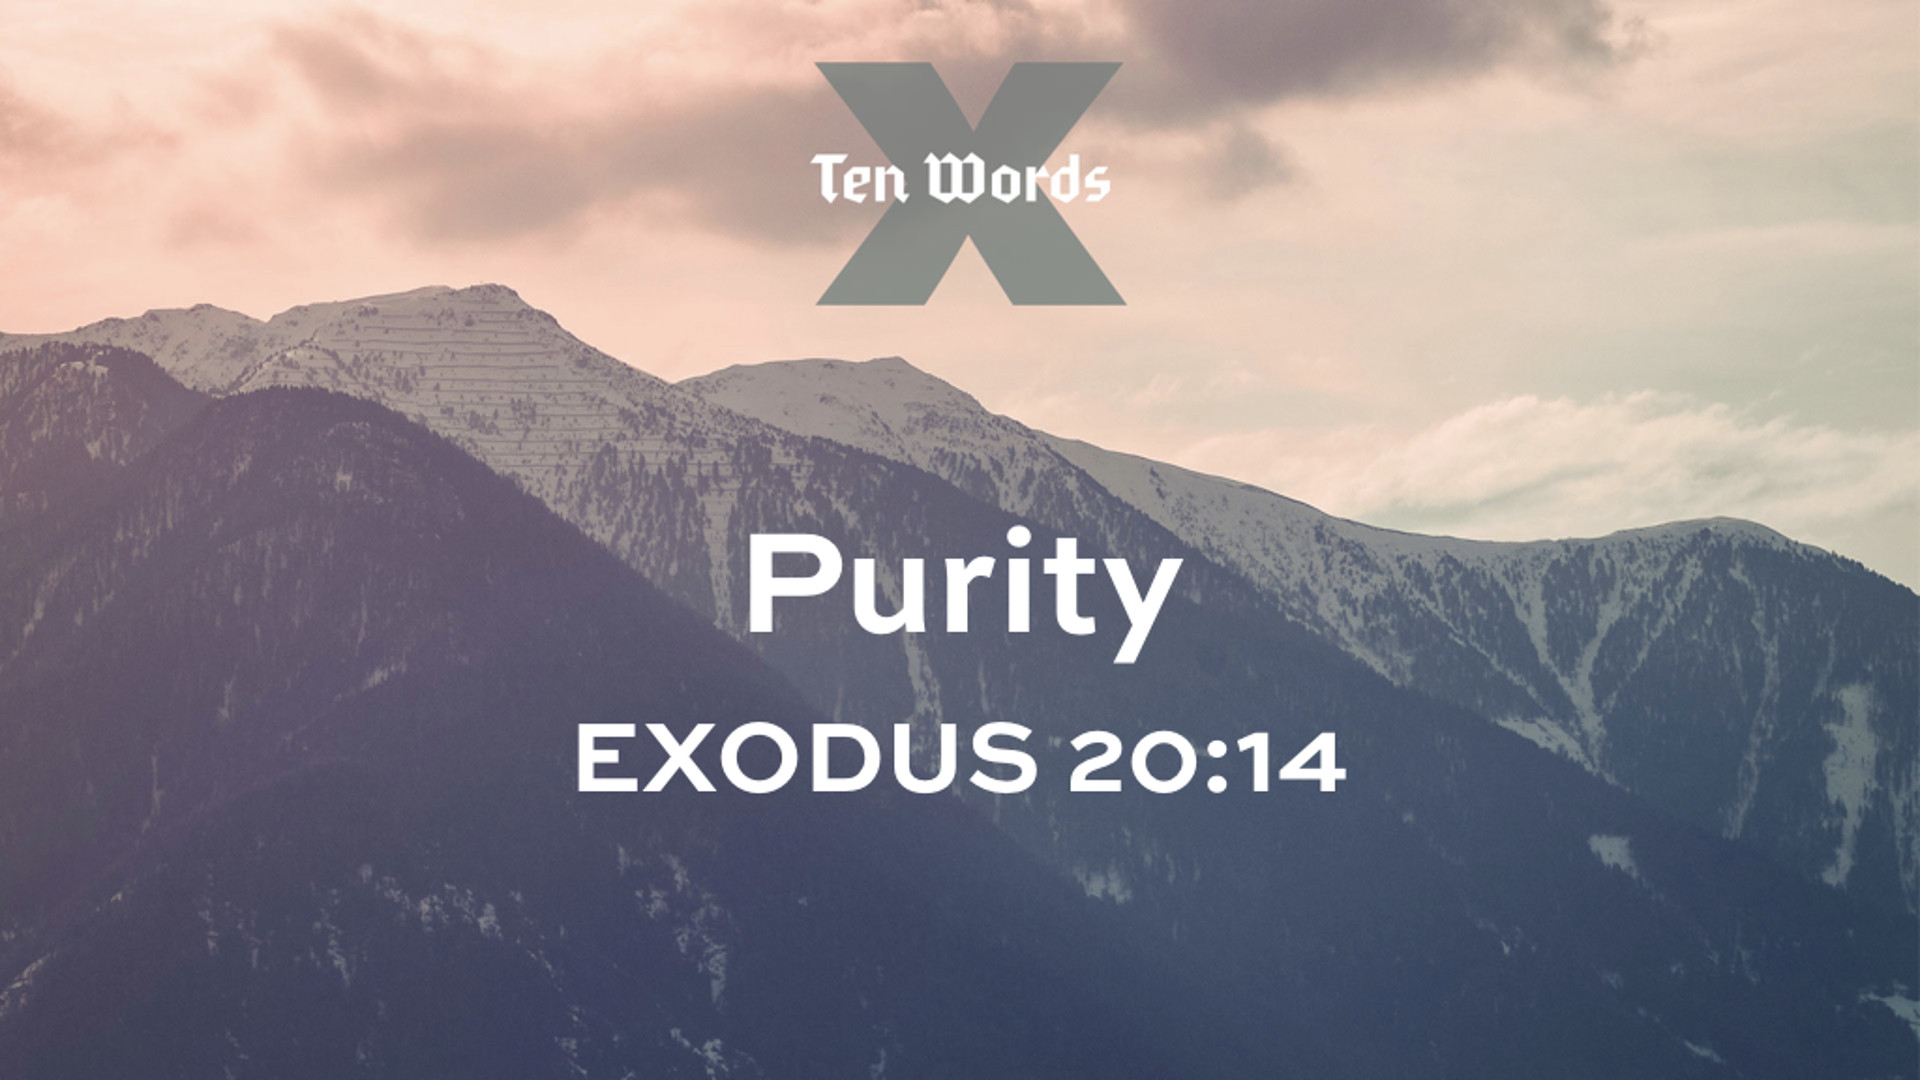 7 Purity - Ex 20.14.jpg